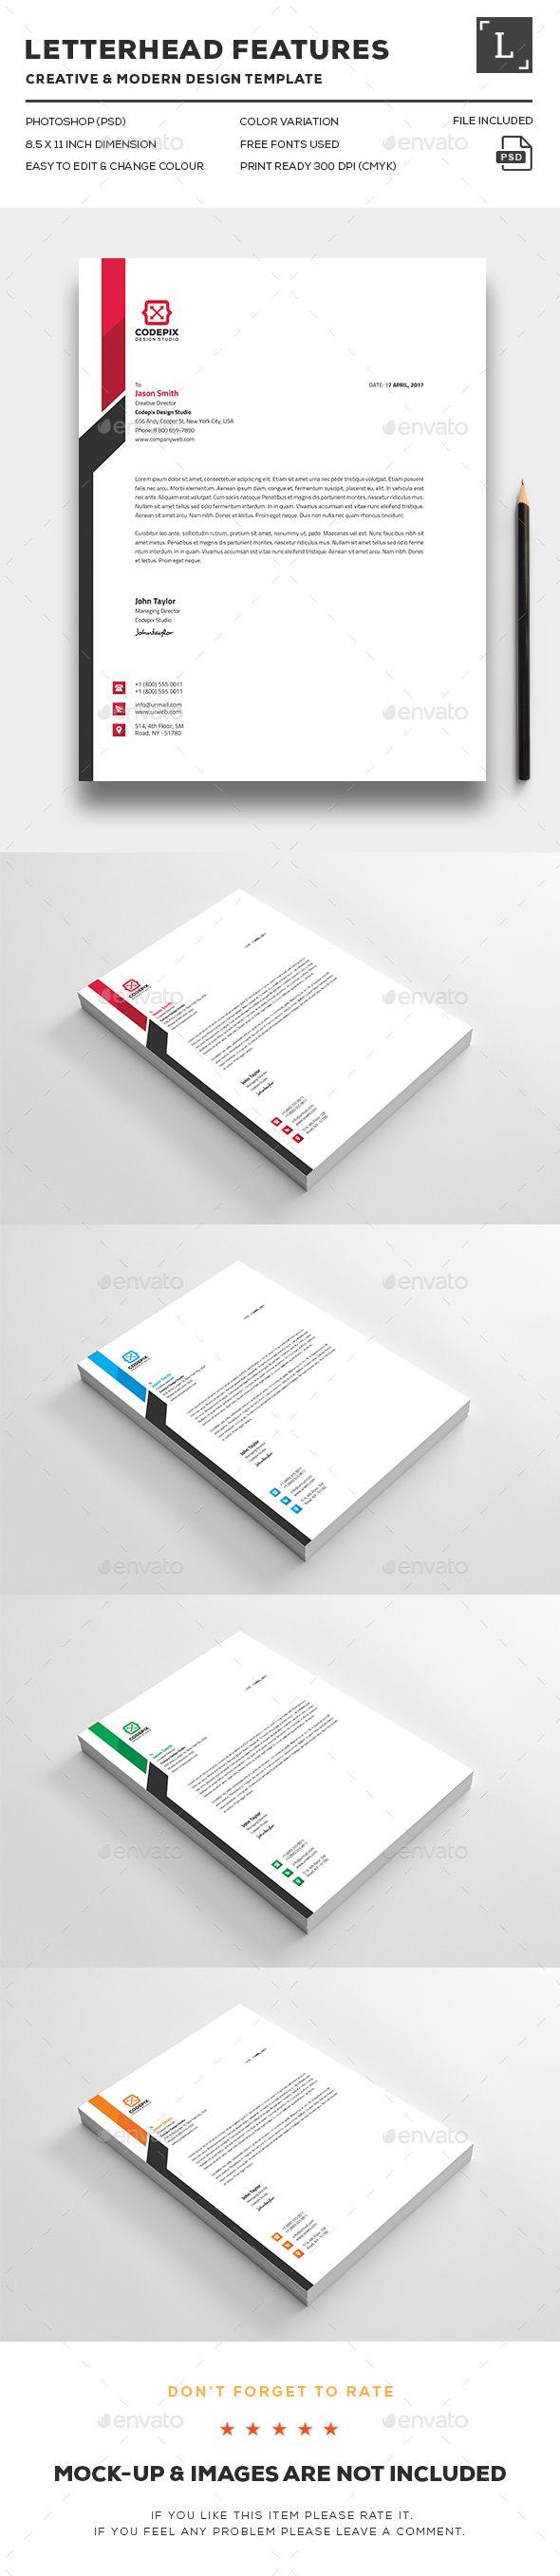 Letterheads letterhead design stationery printing and print templates letterhead design template stationery print template psd download here http spiritdancerdesigns Images